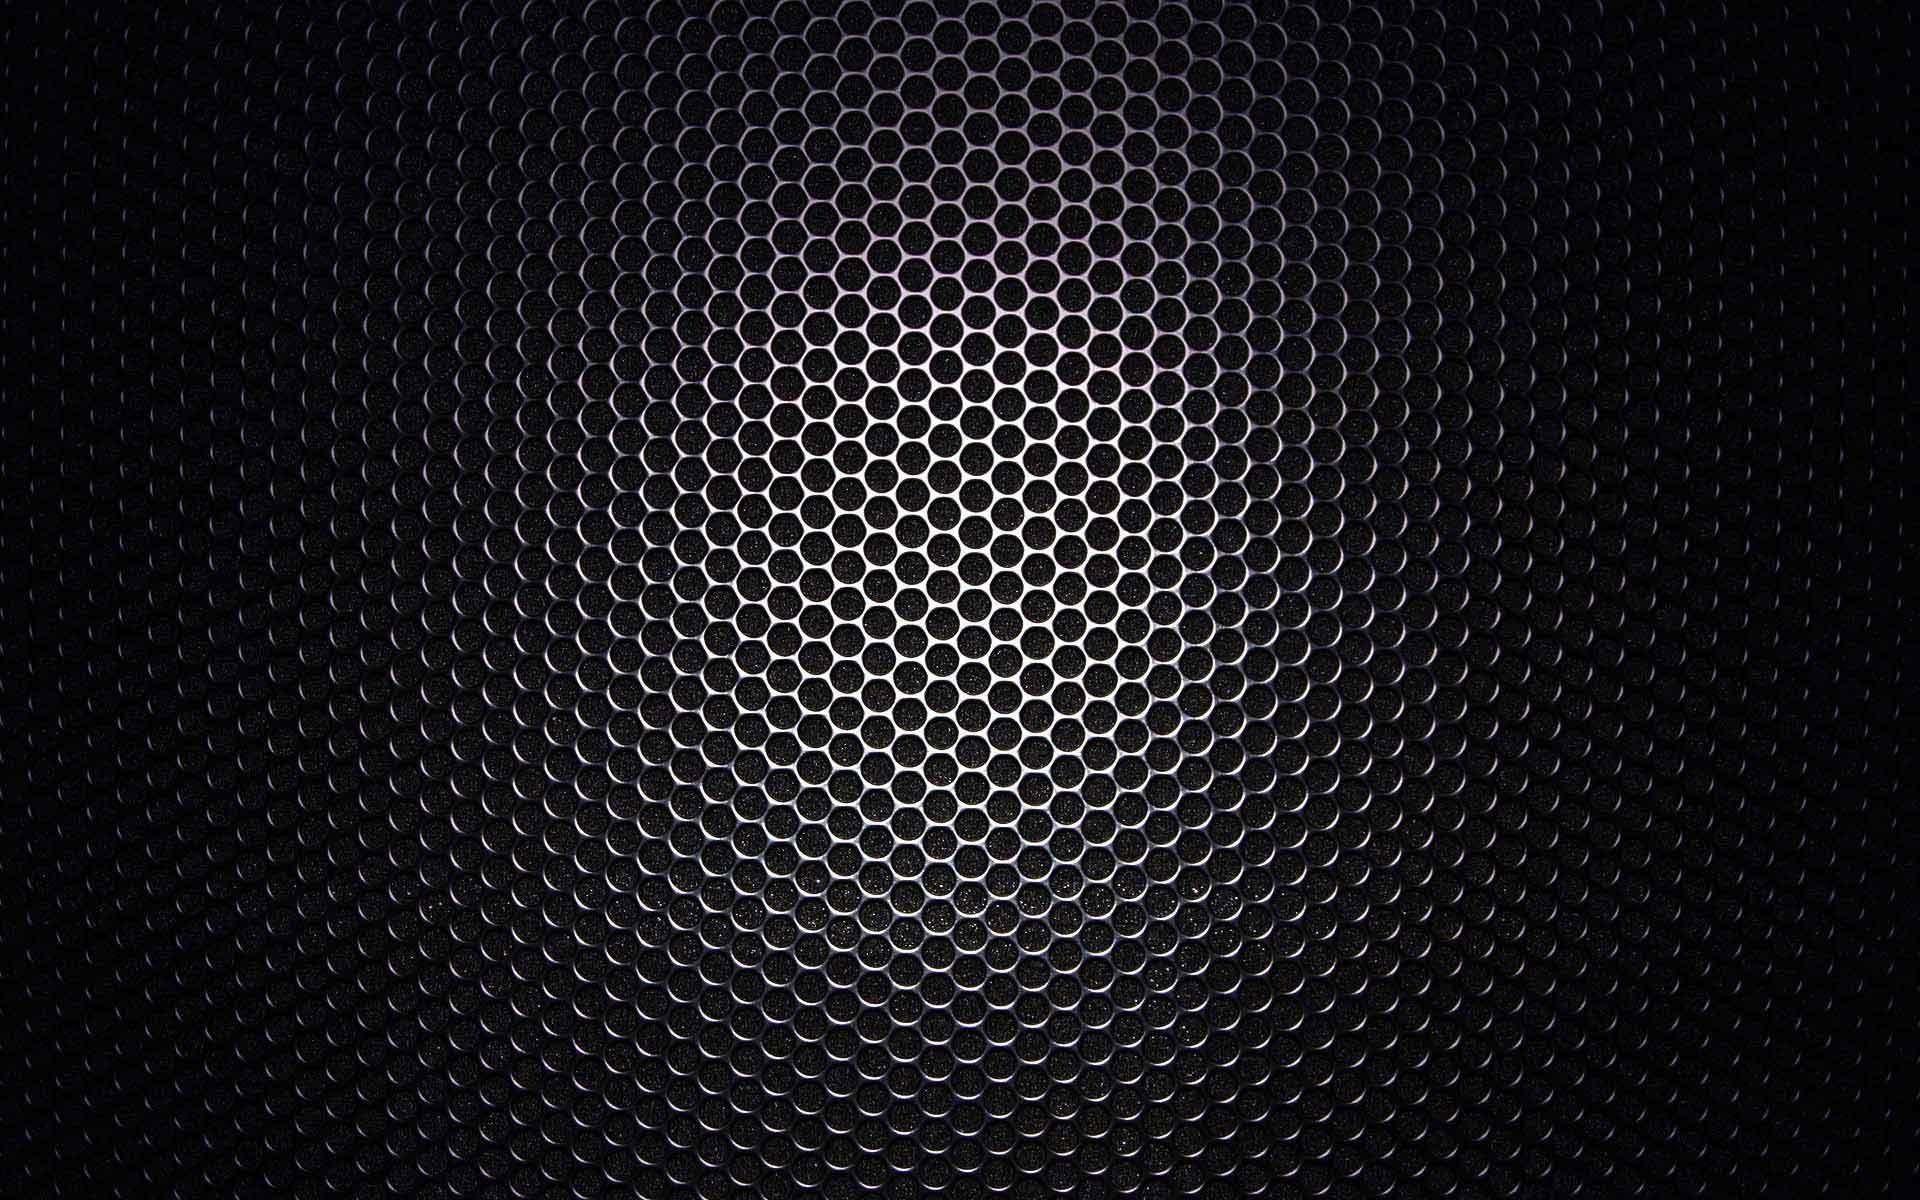 Pure Black Wallpaper 66 images